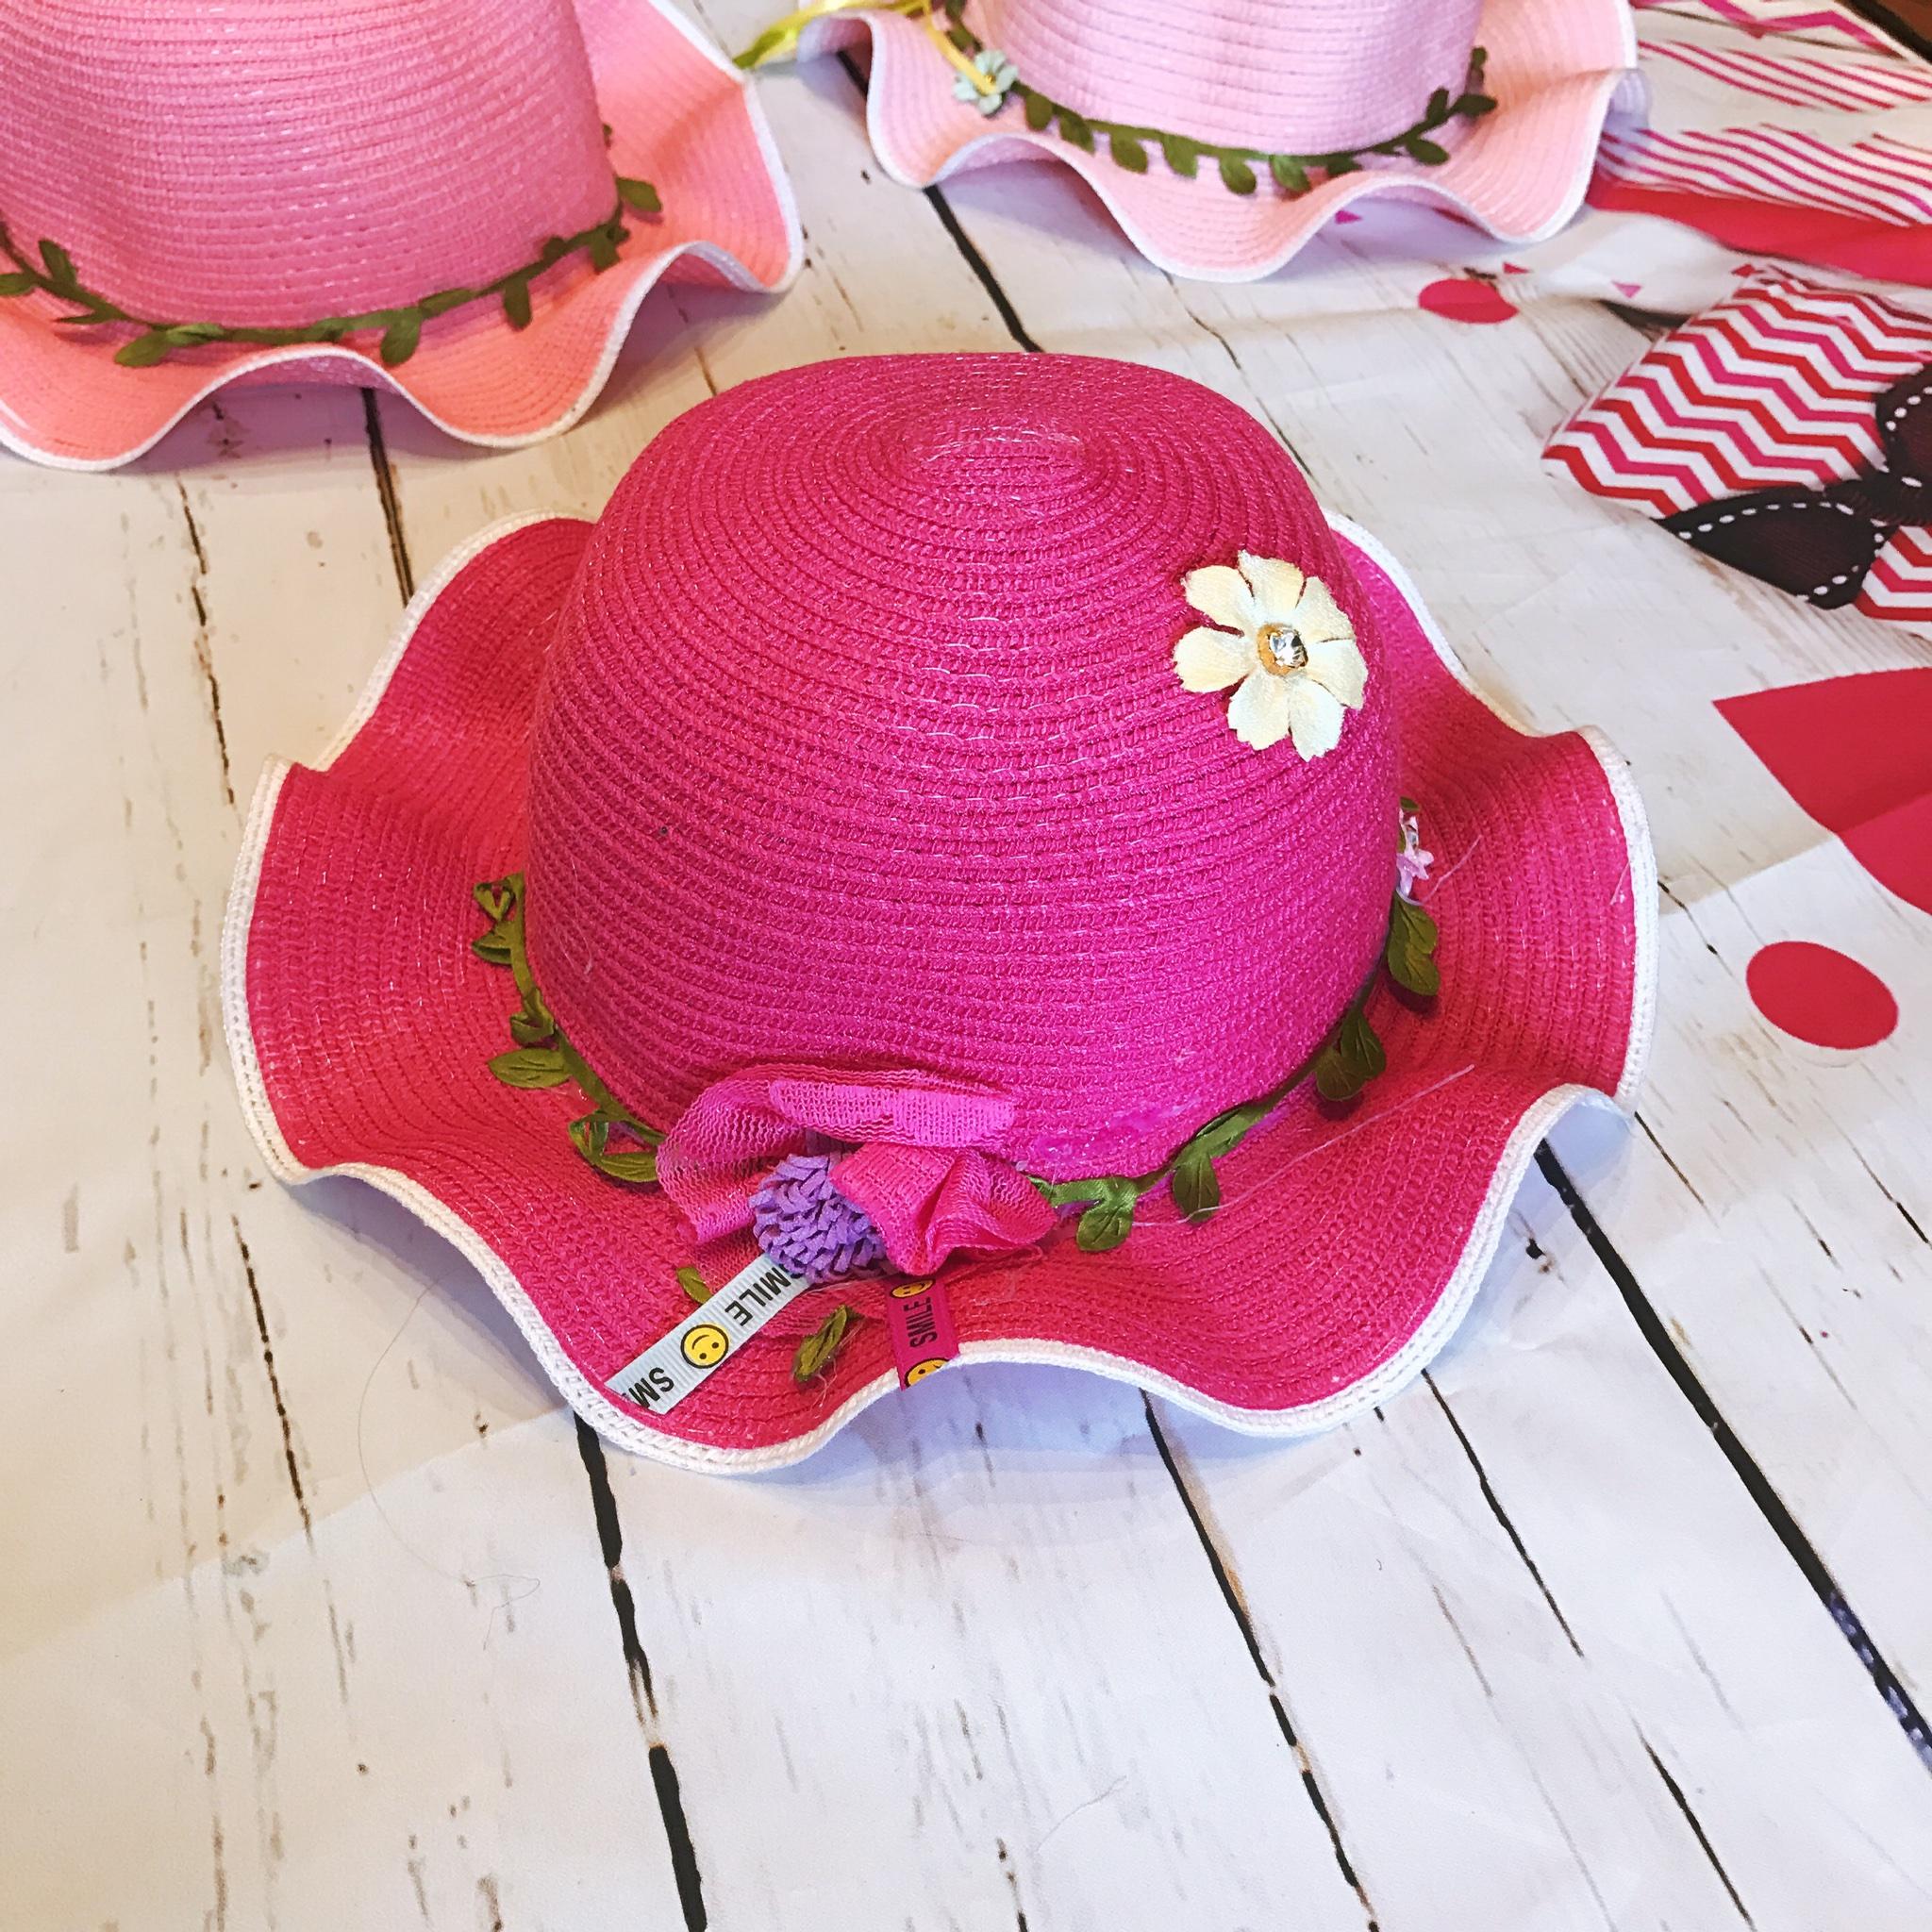 Mũ bèo 1 hoa